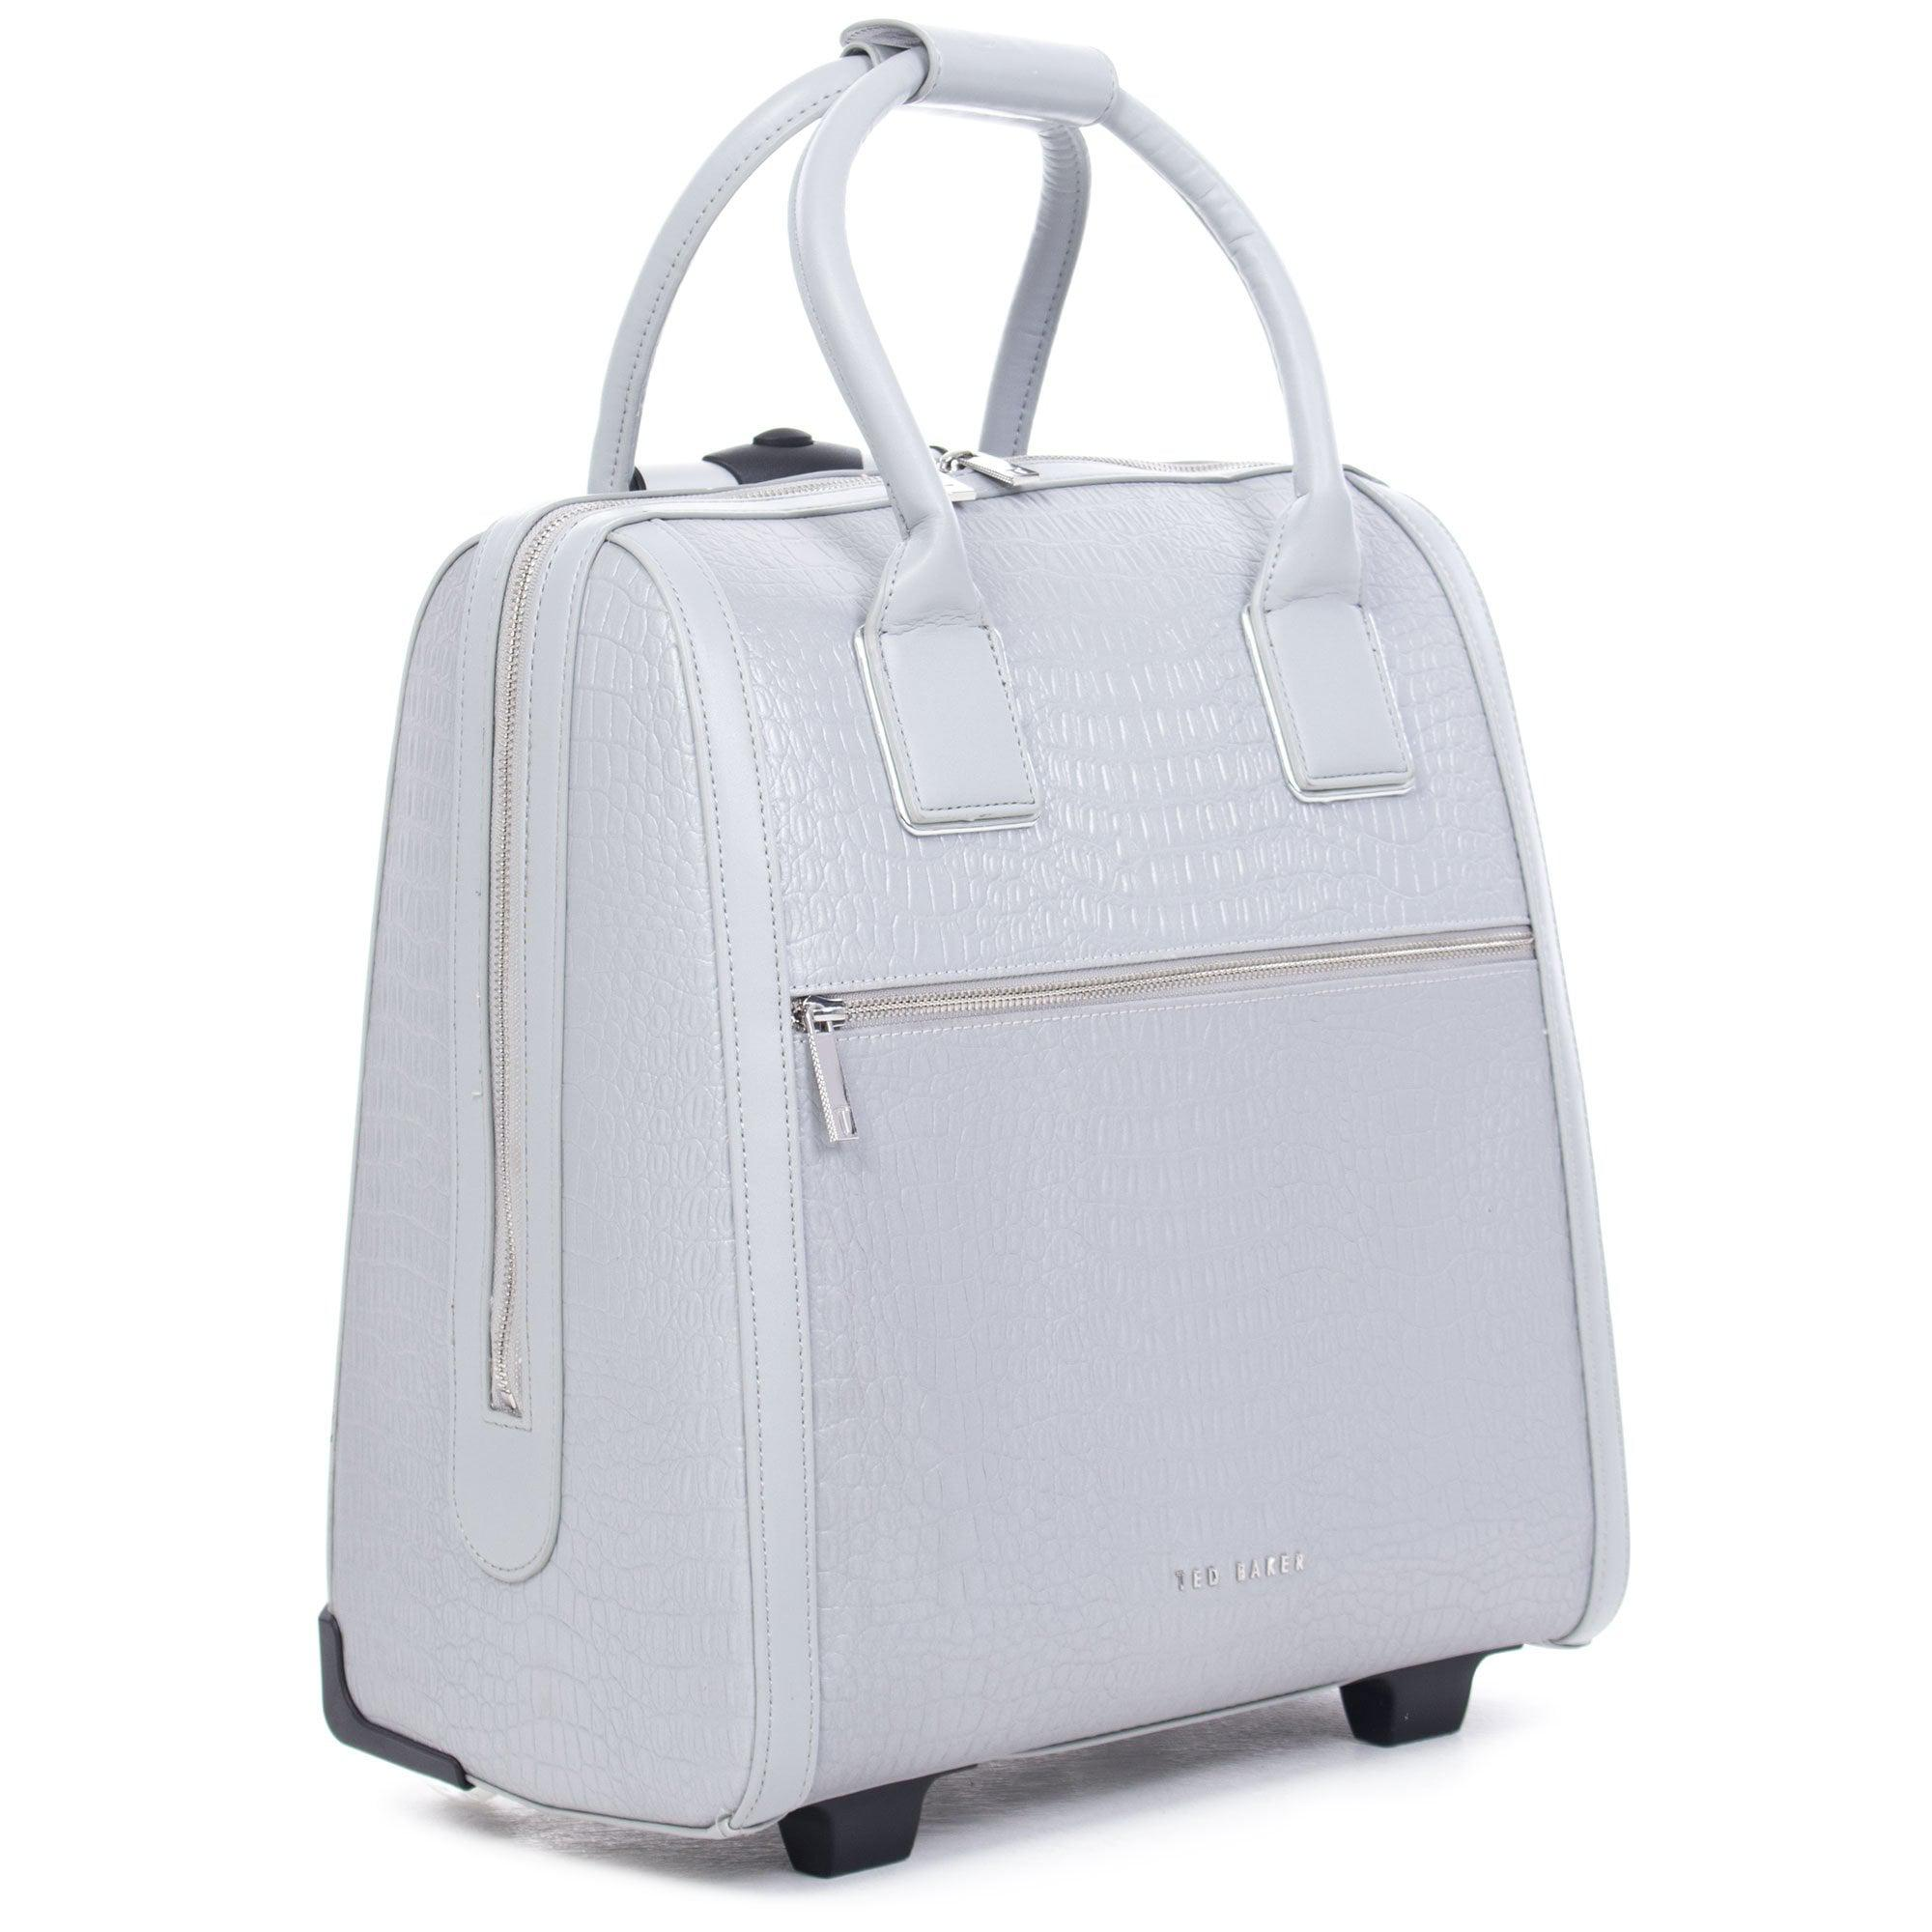 84465c942442 Ted Baker Cressa Croc Embossed Travel Bag in Metallic - Lyst